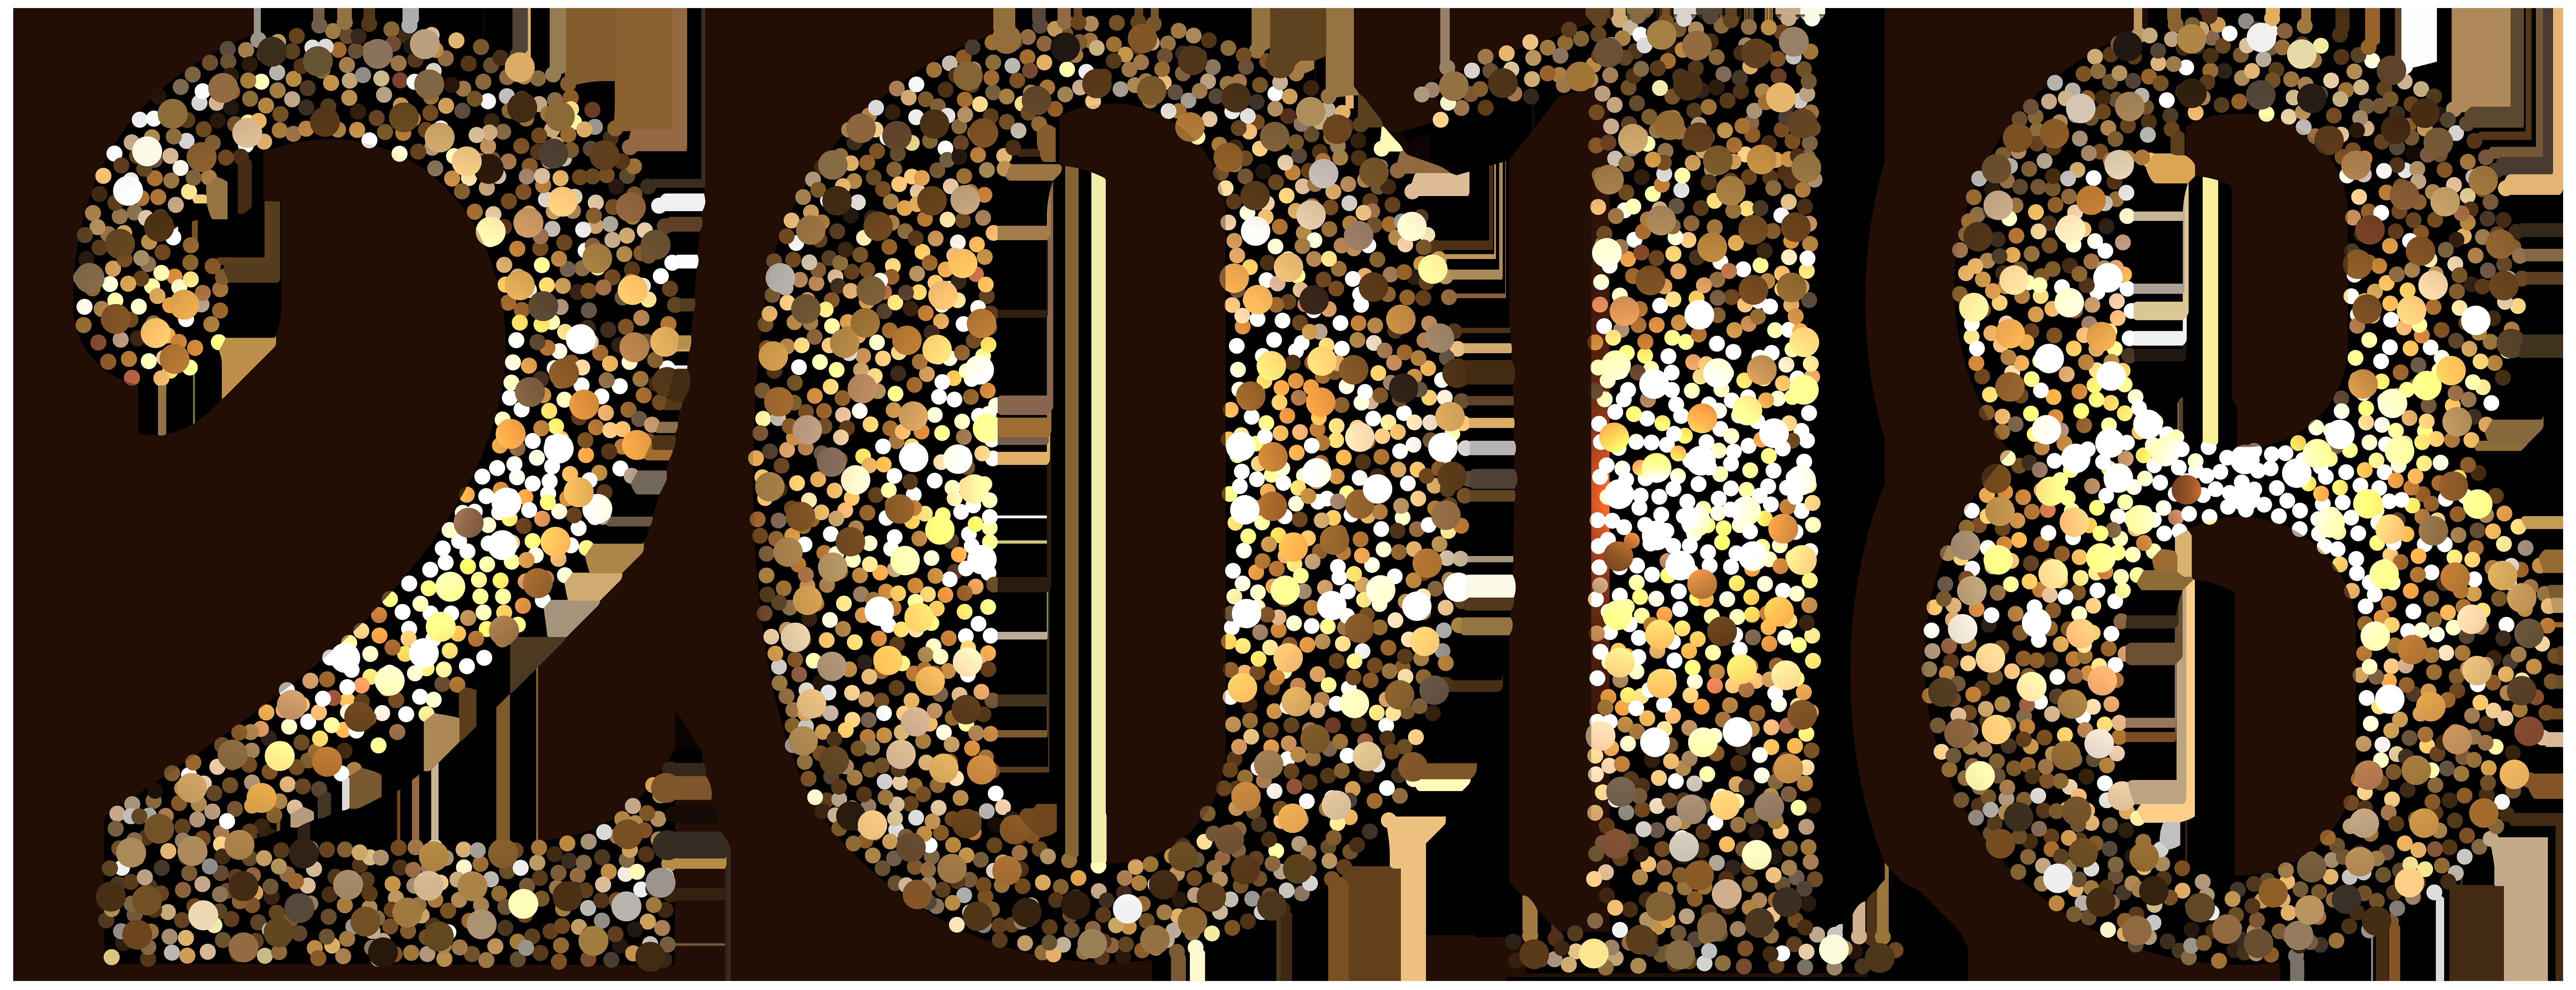 2018 free clipart svg freeuse 2018 Decorative Transparent Clip Art Image | Gallery Yopriceville ... svg freeuse